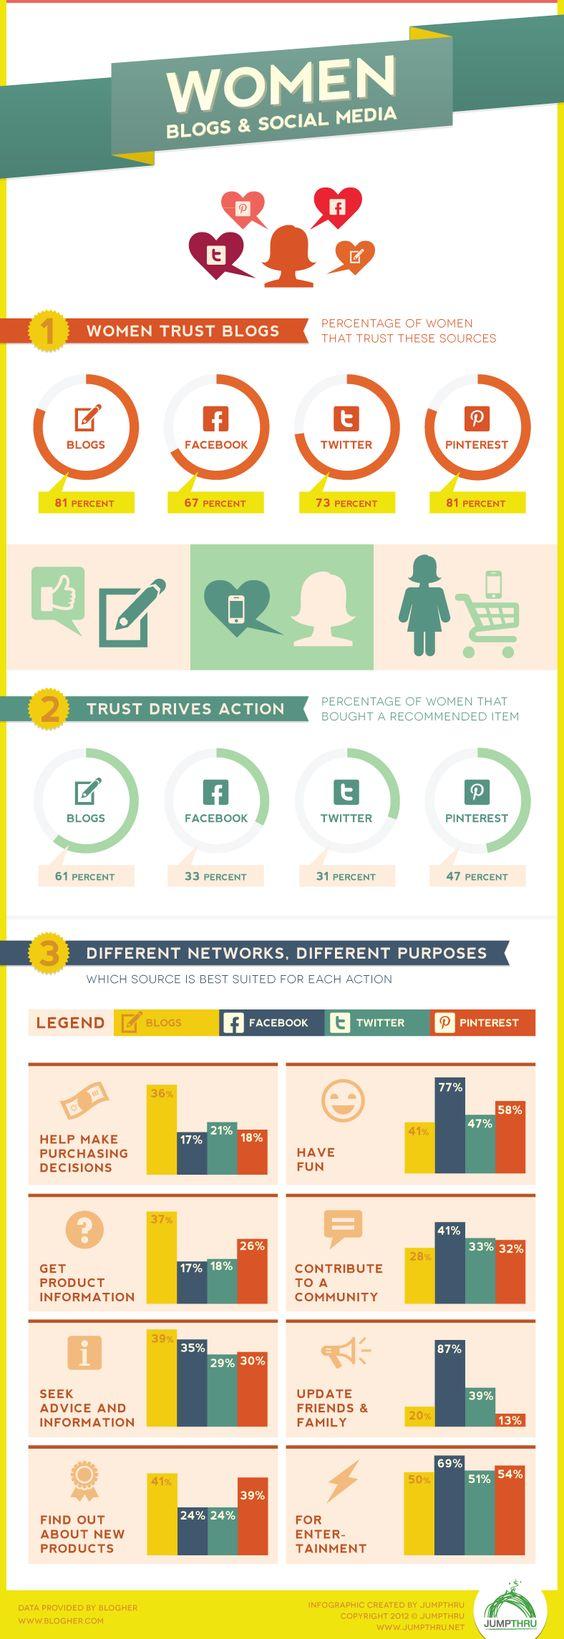 Women Trust Pinterest More Than Twitter, Prefer Blogs For Purchase Decisions